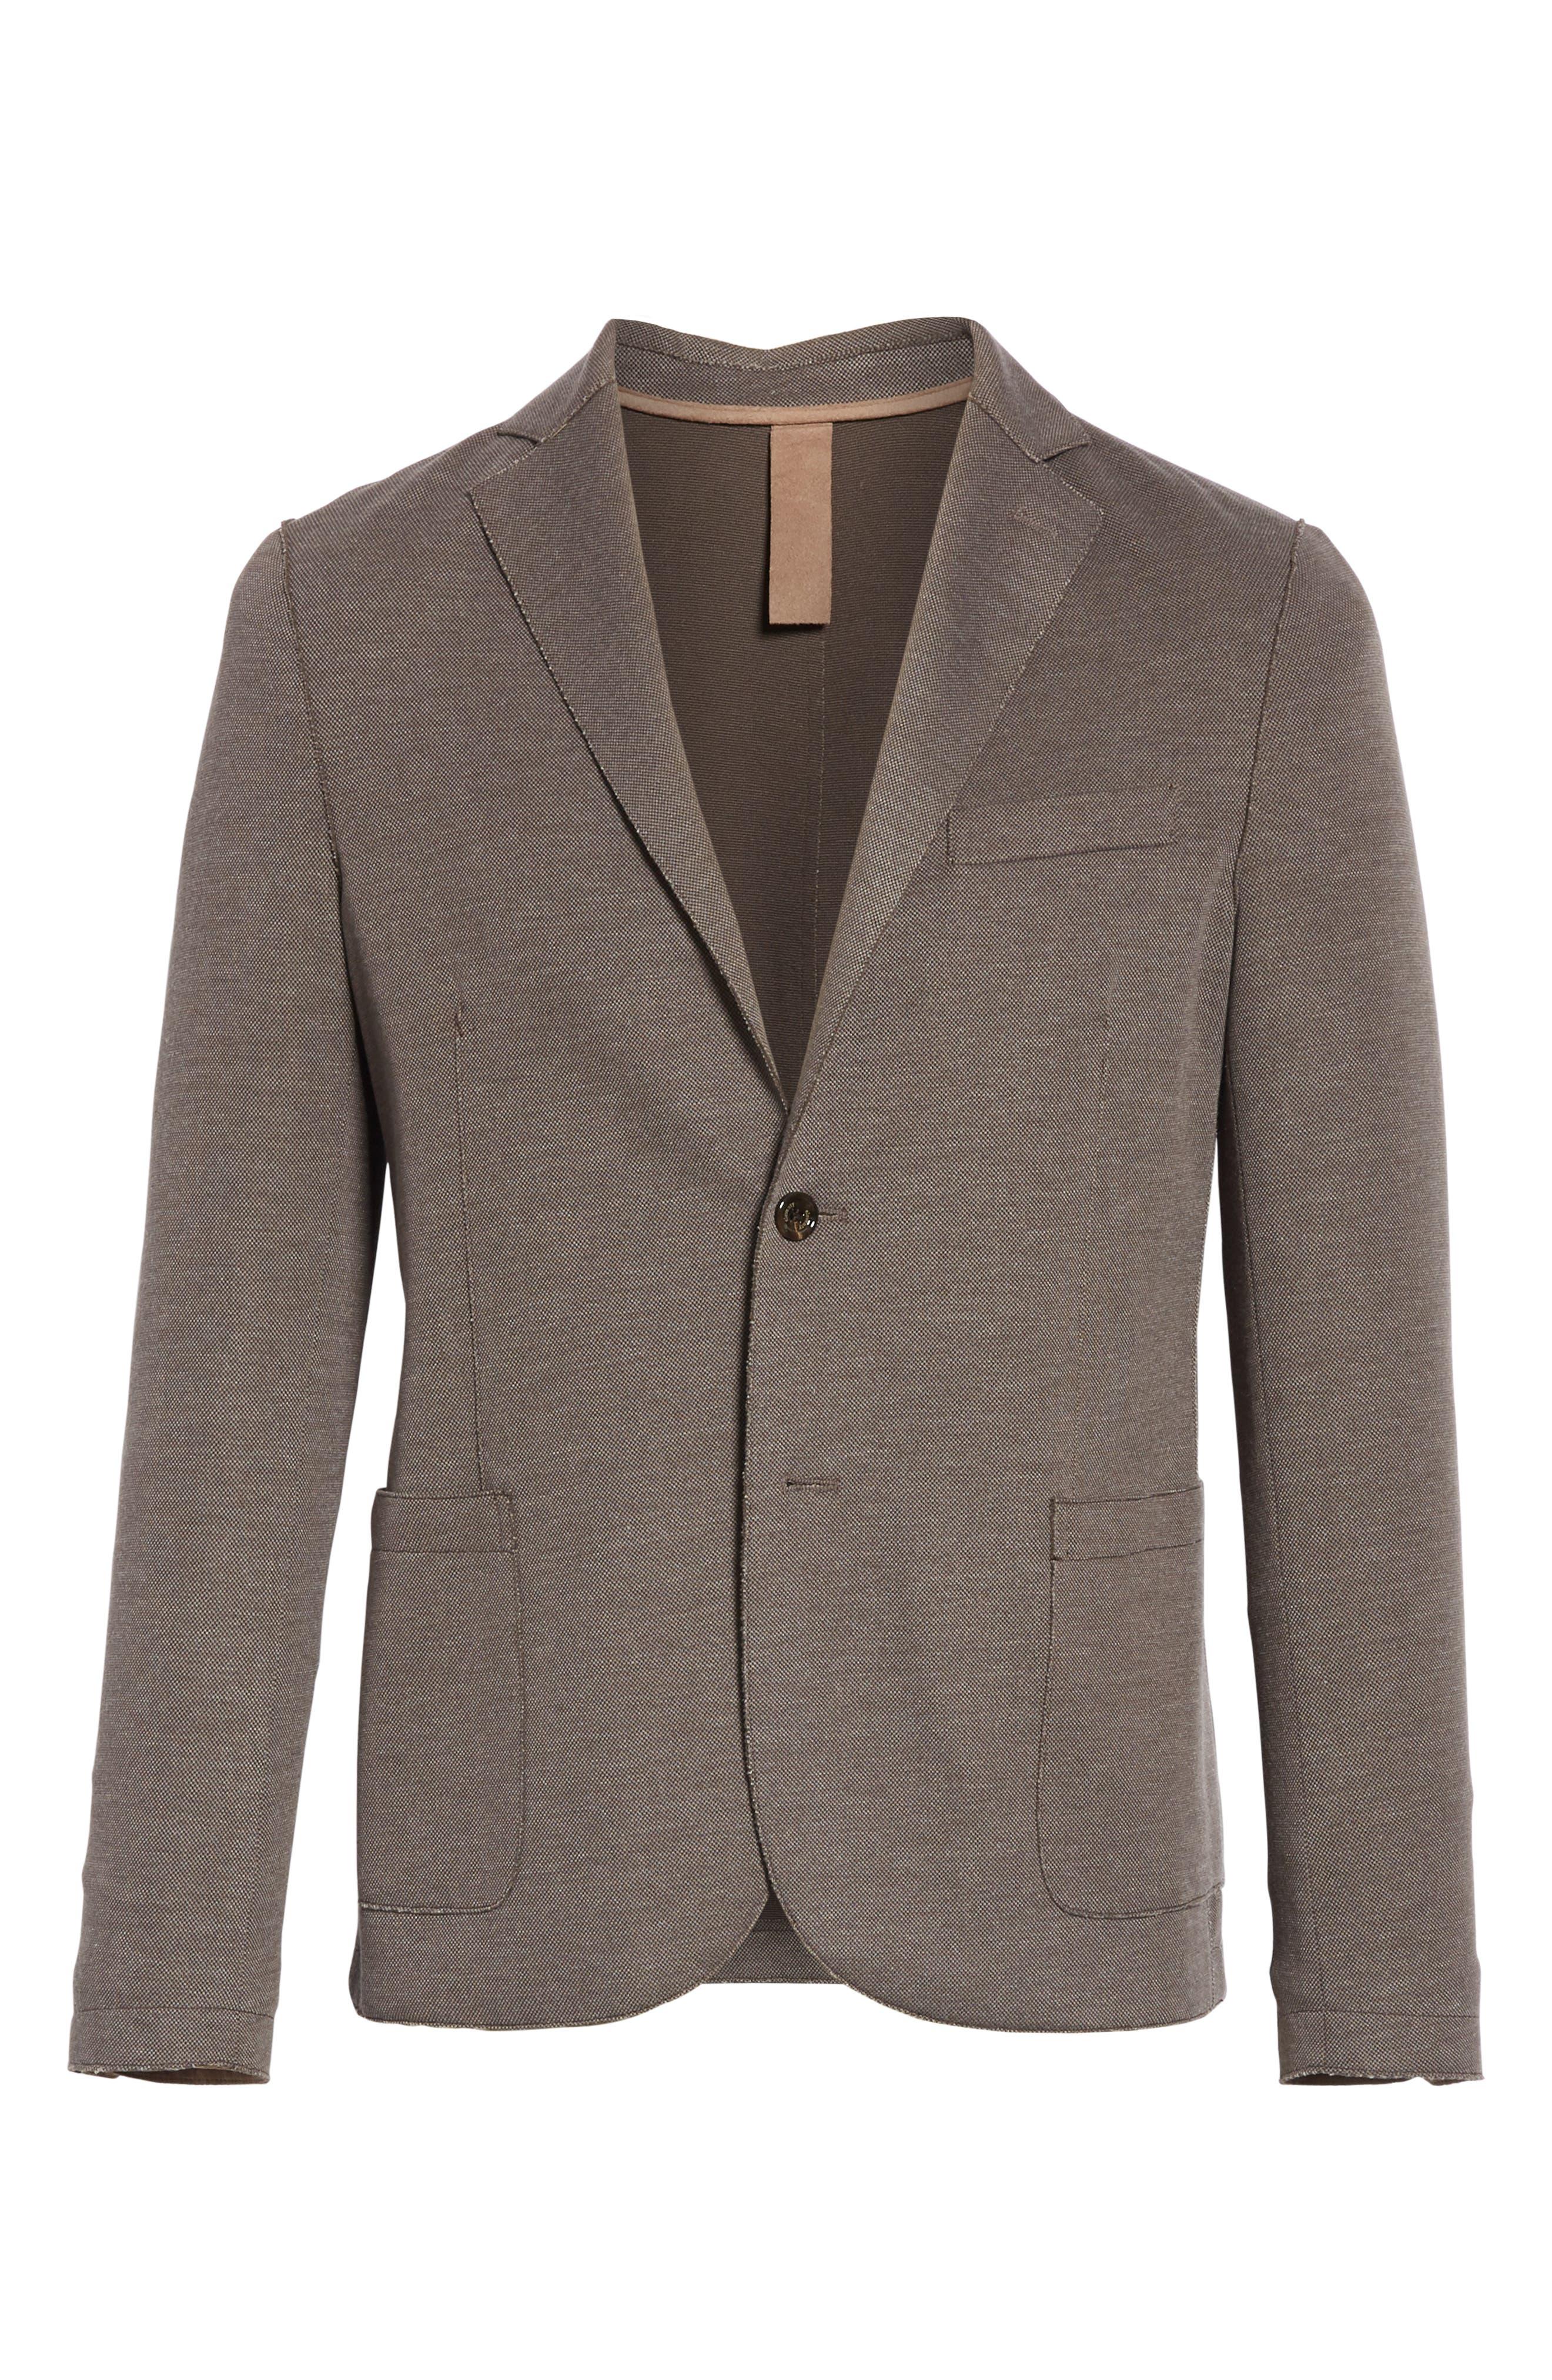 ELEVENTY,                             Trim Fit Jersey Sport Coat,                             Alternate thumbnail 5, color,                             BROWN